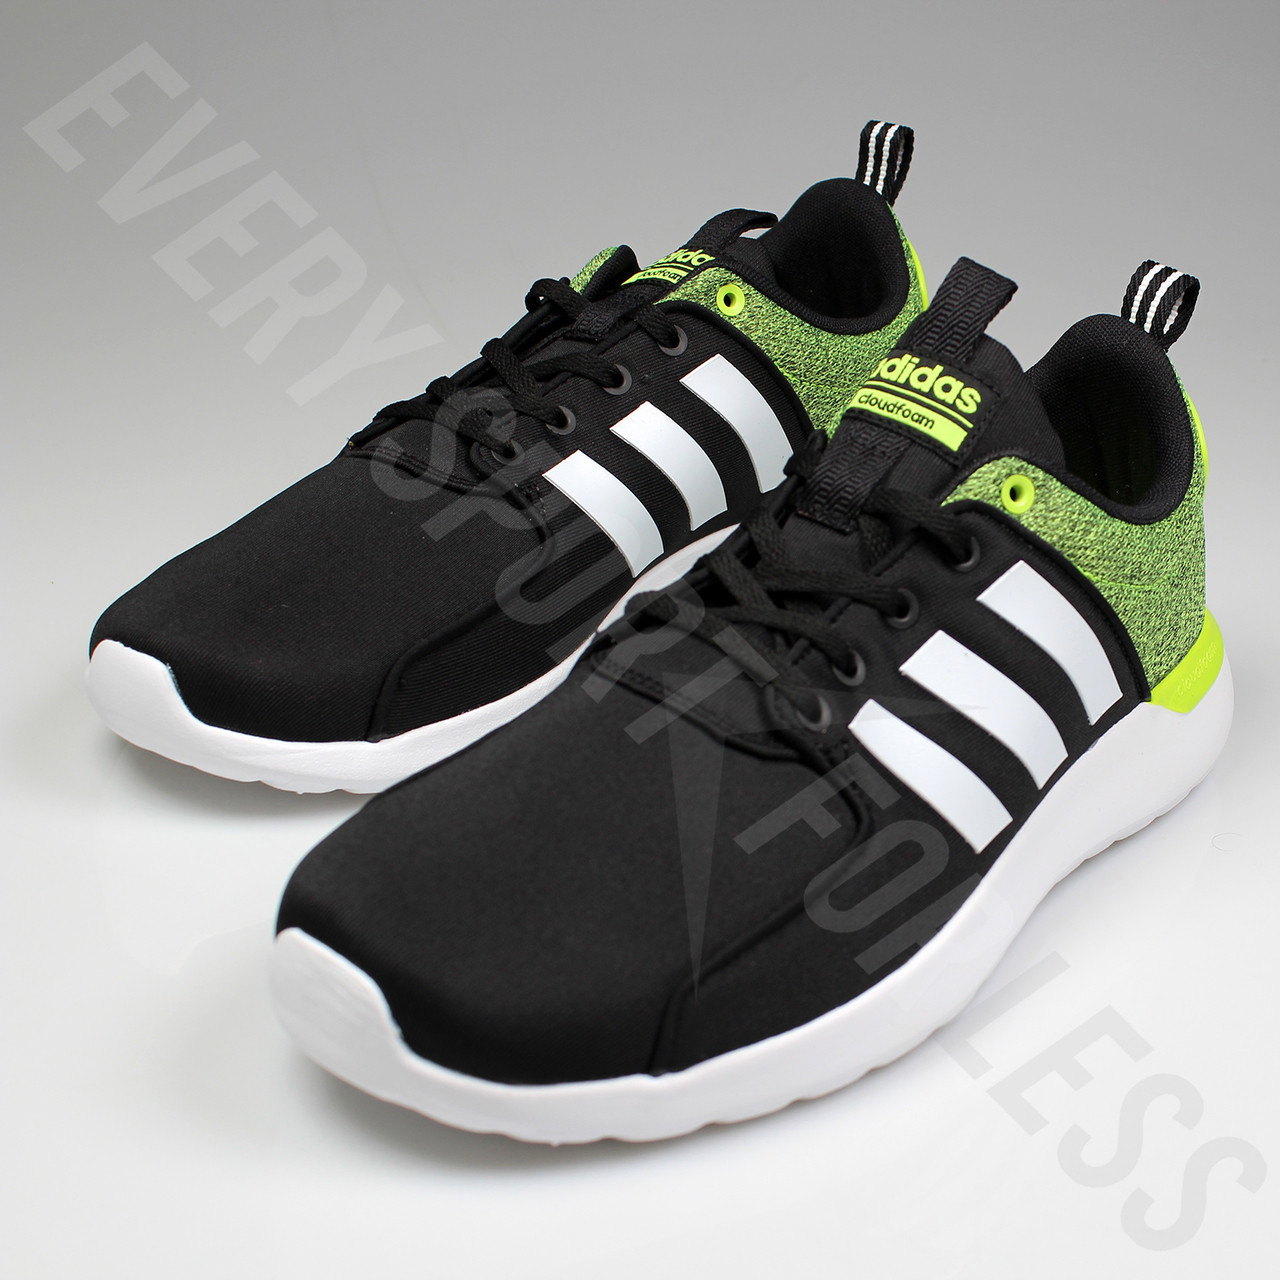 Adidas Cloudfoam Lite Racer AW4030 Men's Running Shoe